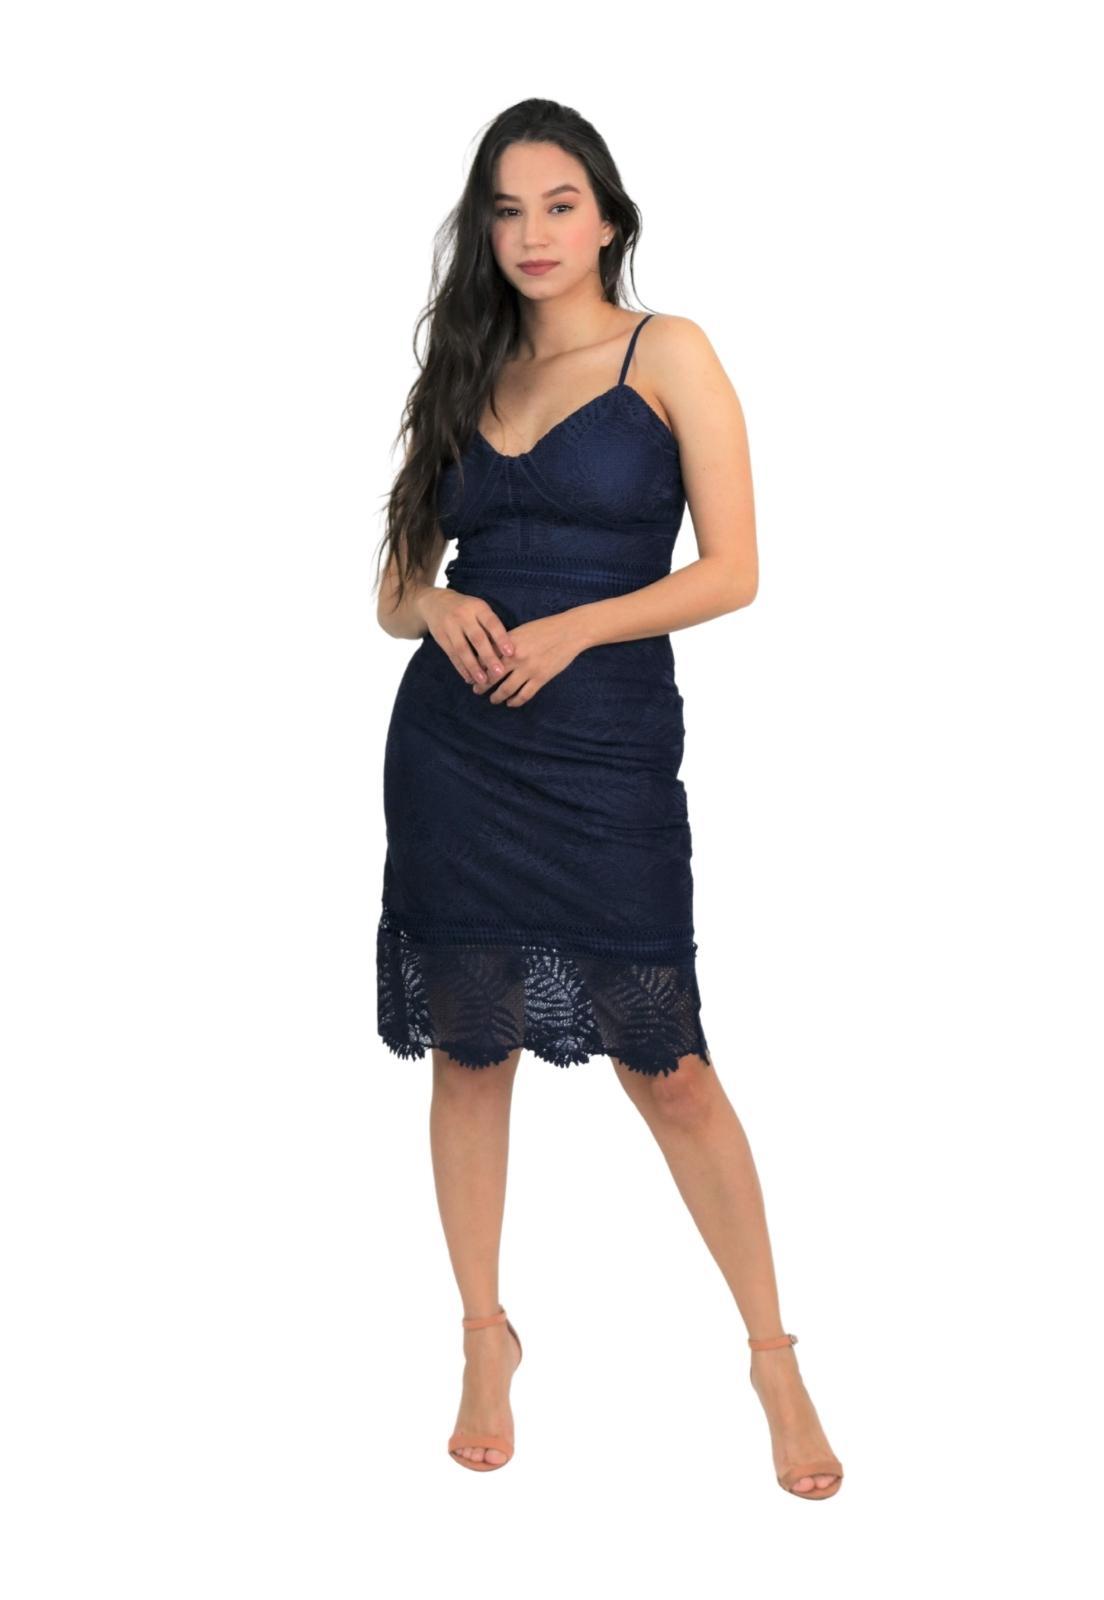 Vestido Feminino Midi Guipir Alça Fina Elegante e Sexy